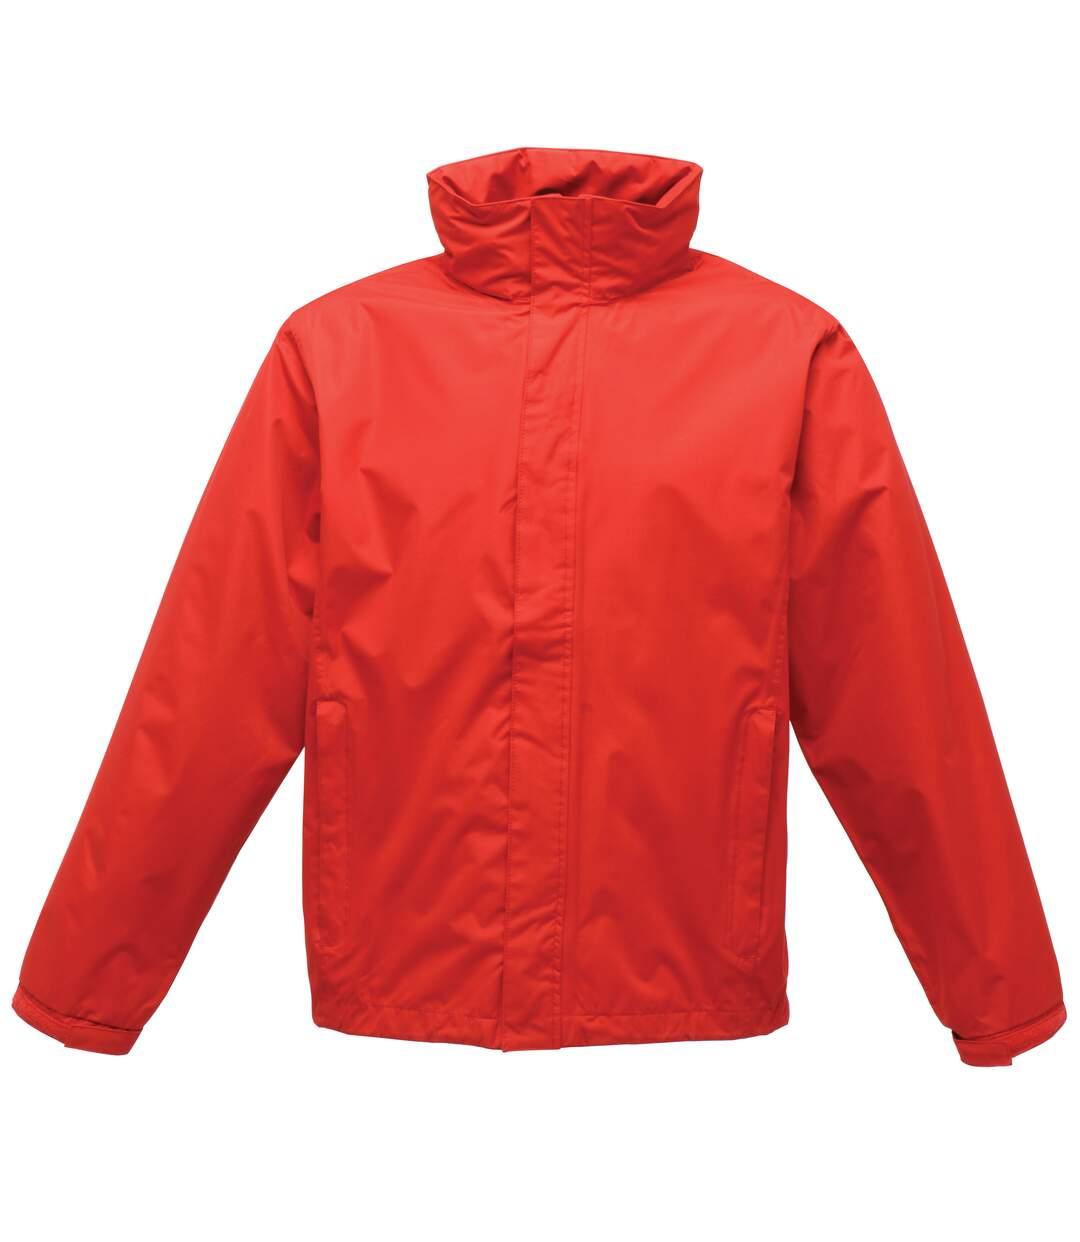 Regatta Mens Pace II Lightweight Waterproof Jacket (Classic Red) - UTRG1546